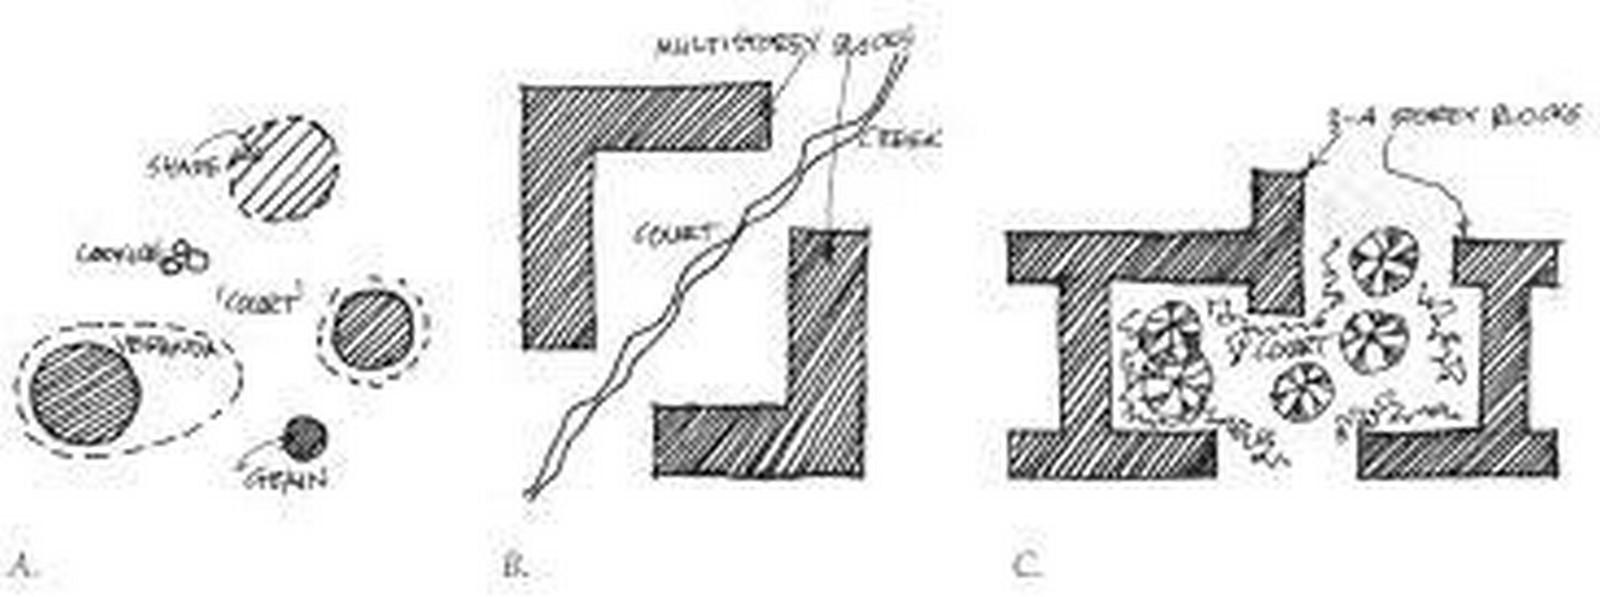 Wayfinding in Architecture - Sheet4